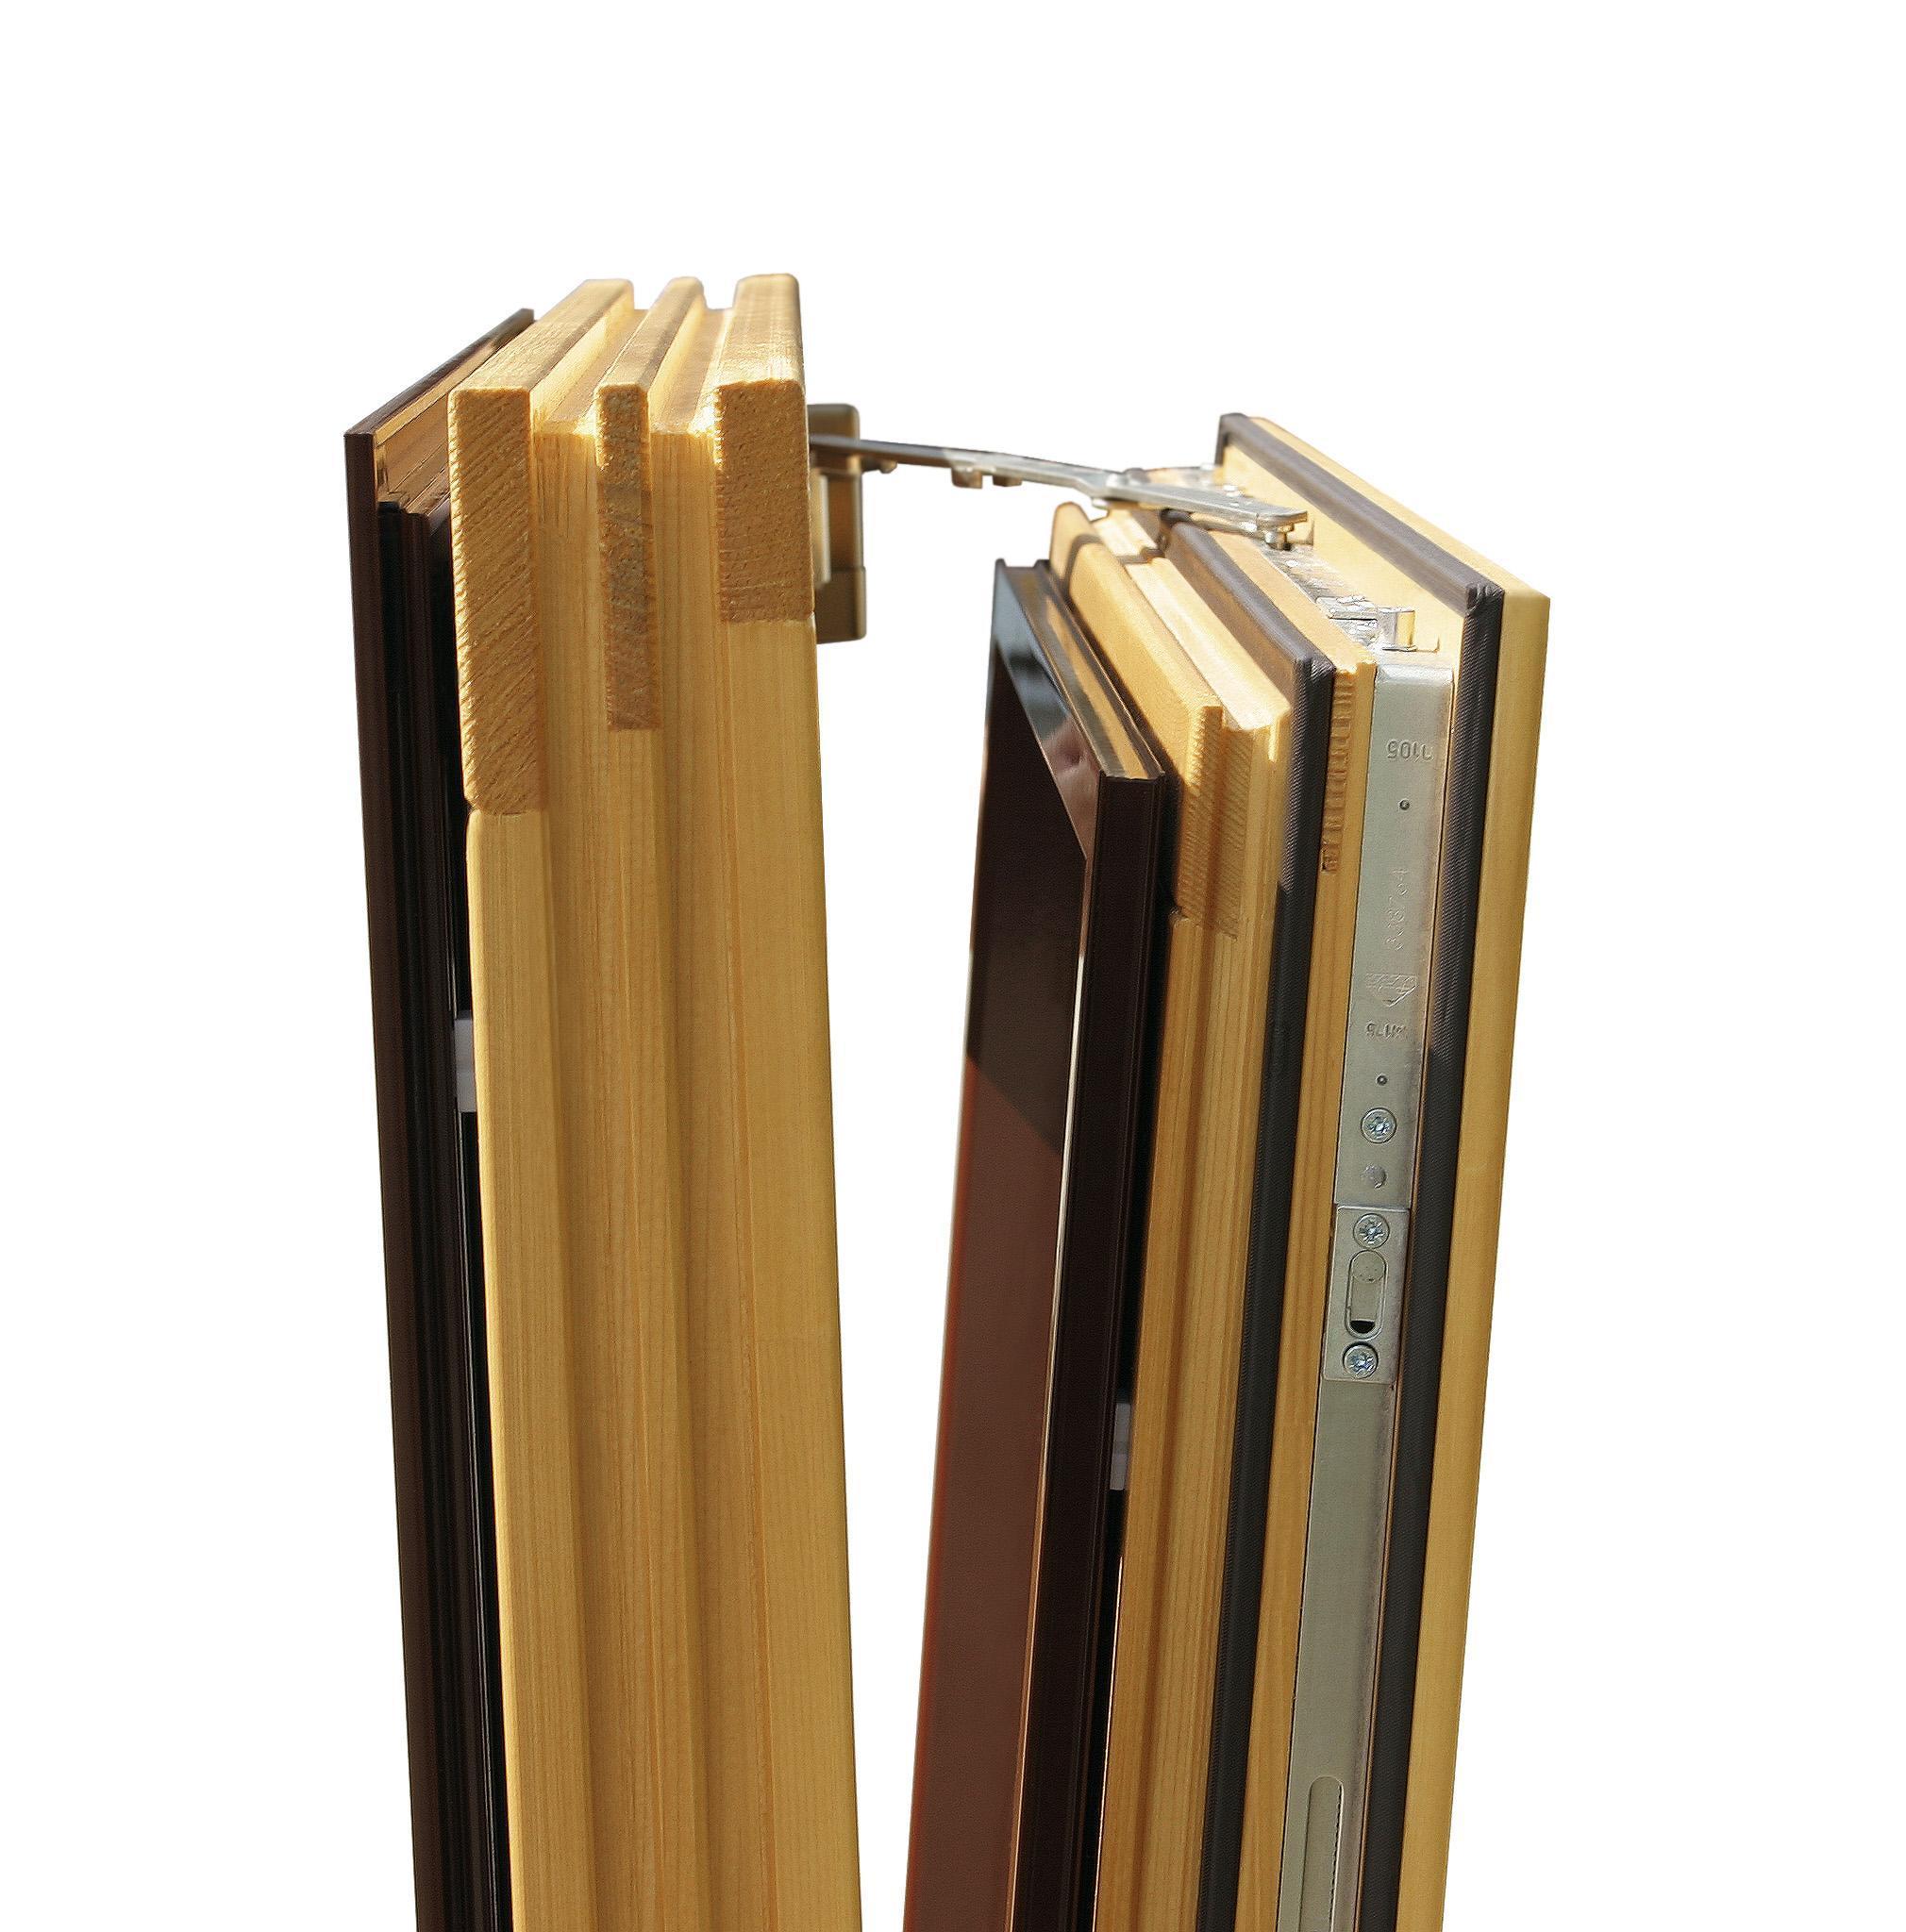 O sistema basculante é ideal para sótãos, gira 180º na horizontal ou na vertical.